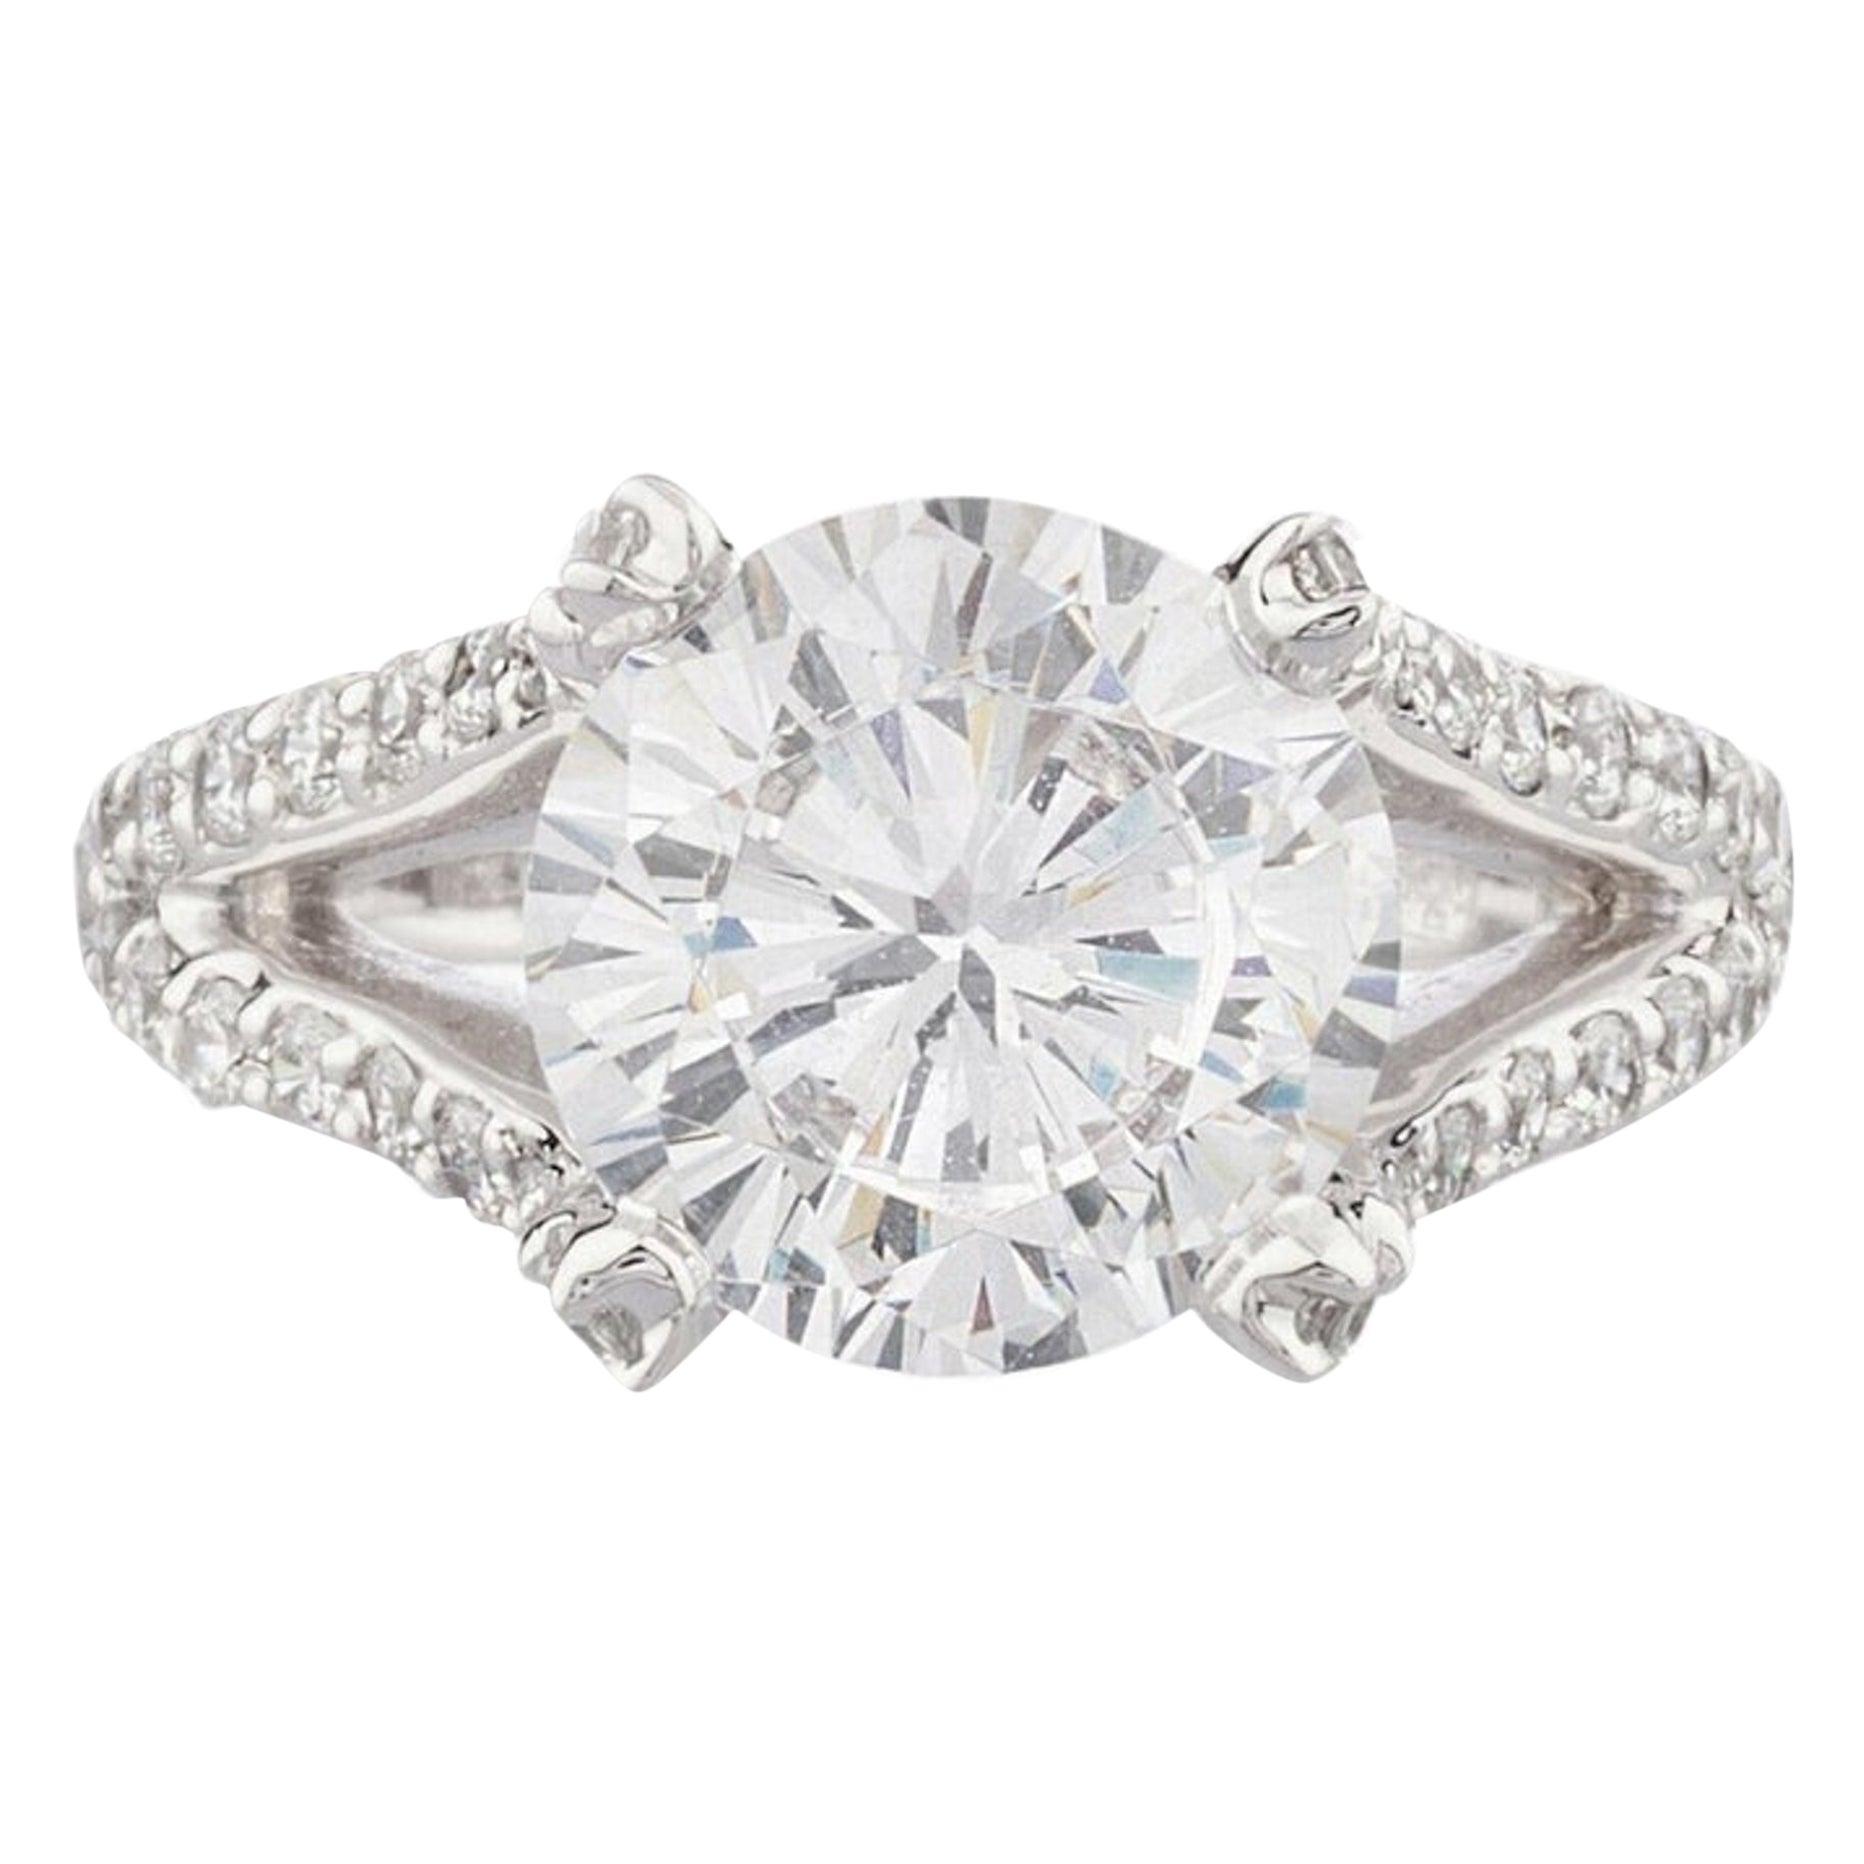 GIA 4 Carat Round Brilliant Cut Diamond Ring VVS1 F Color